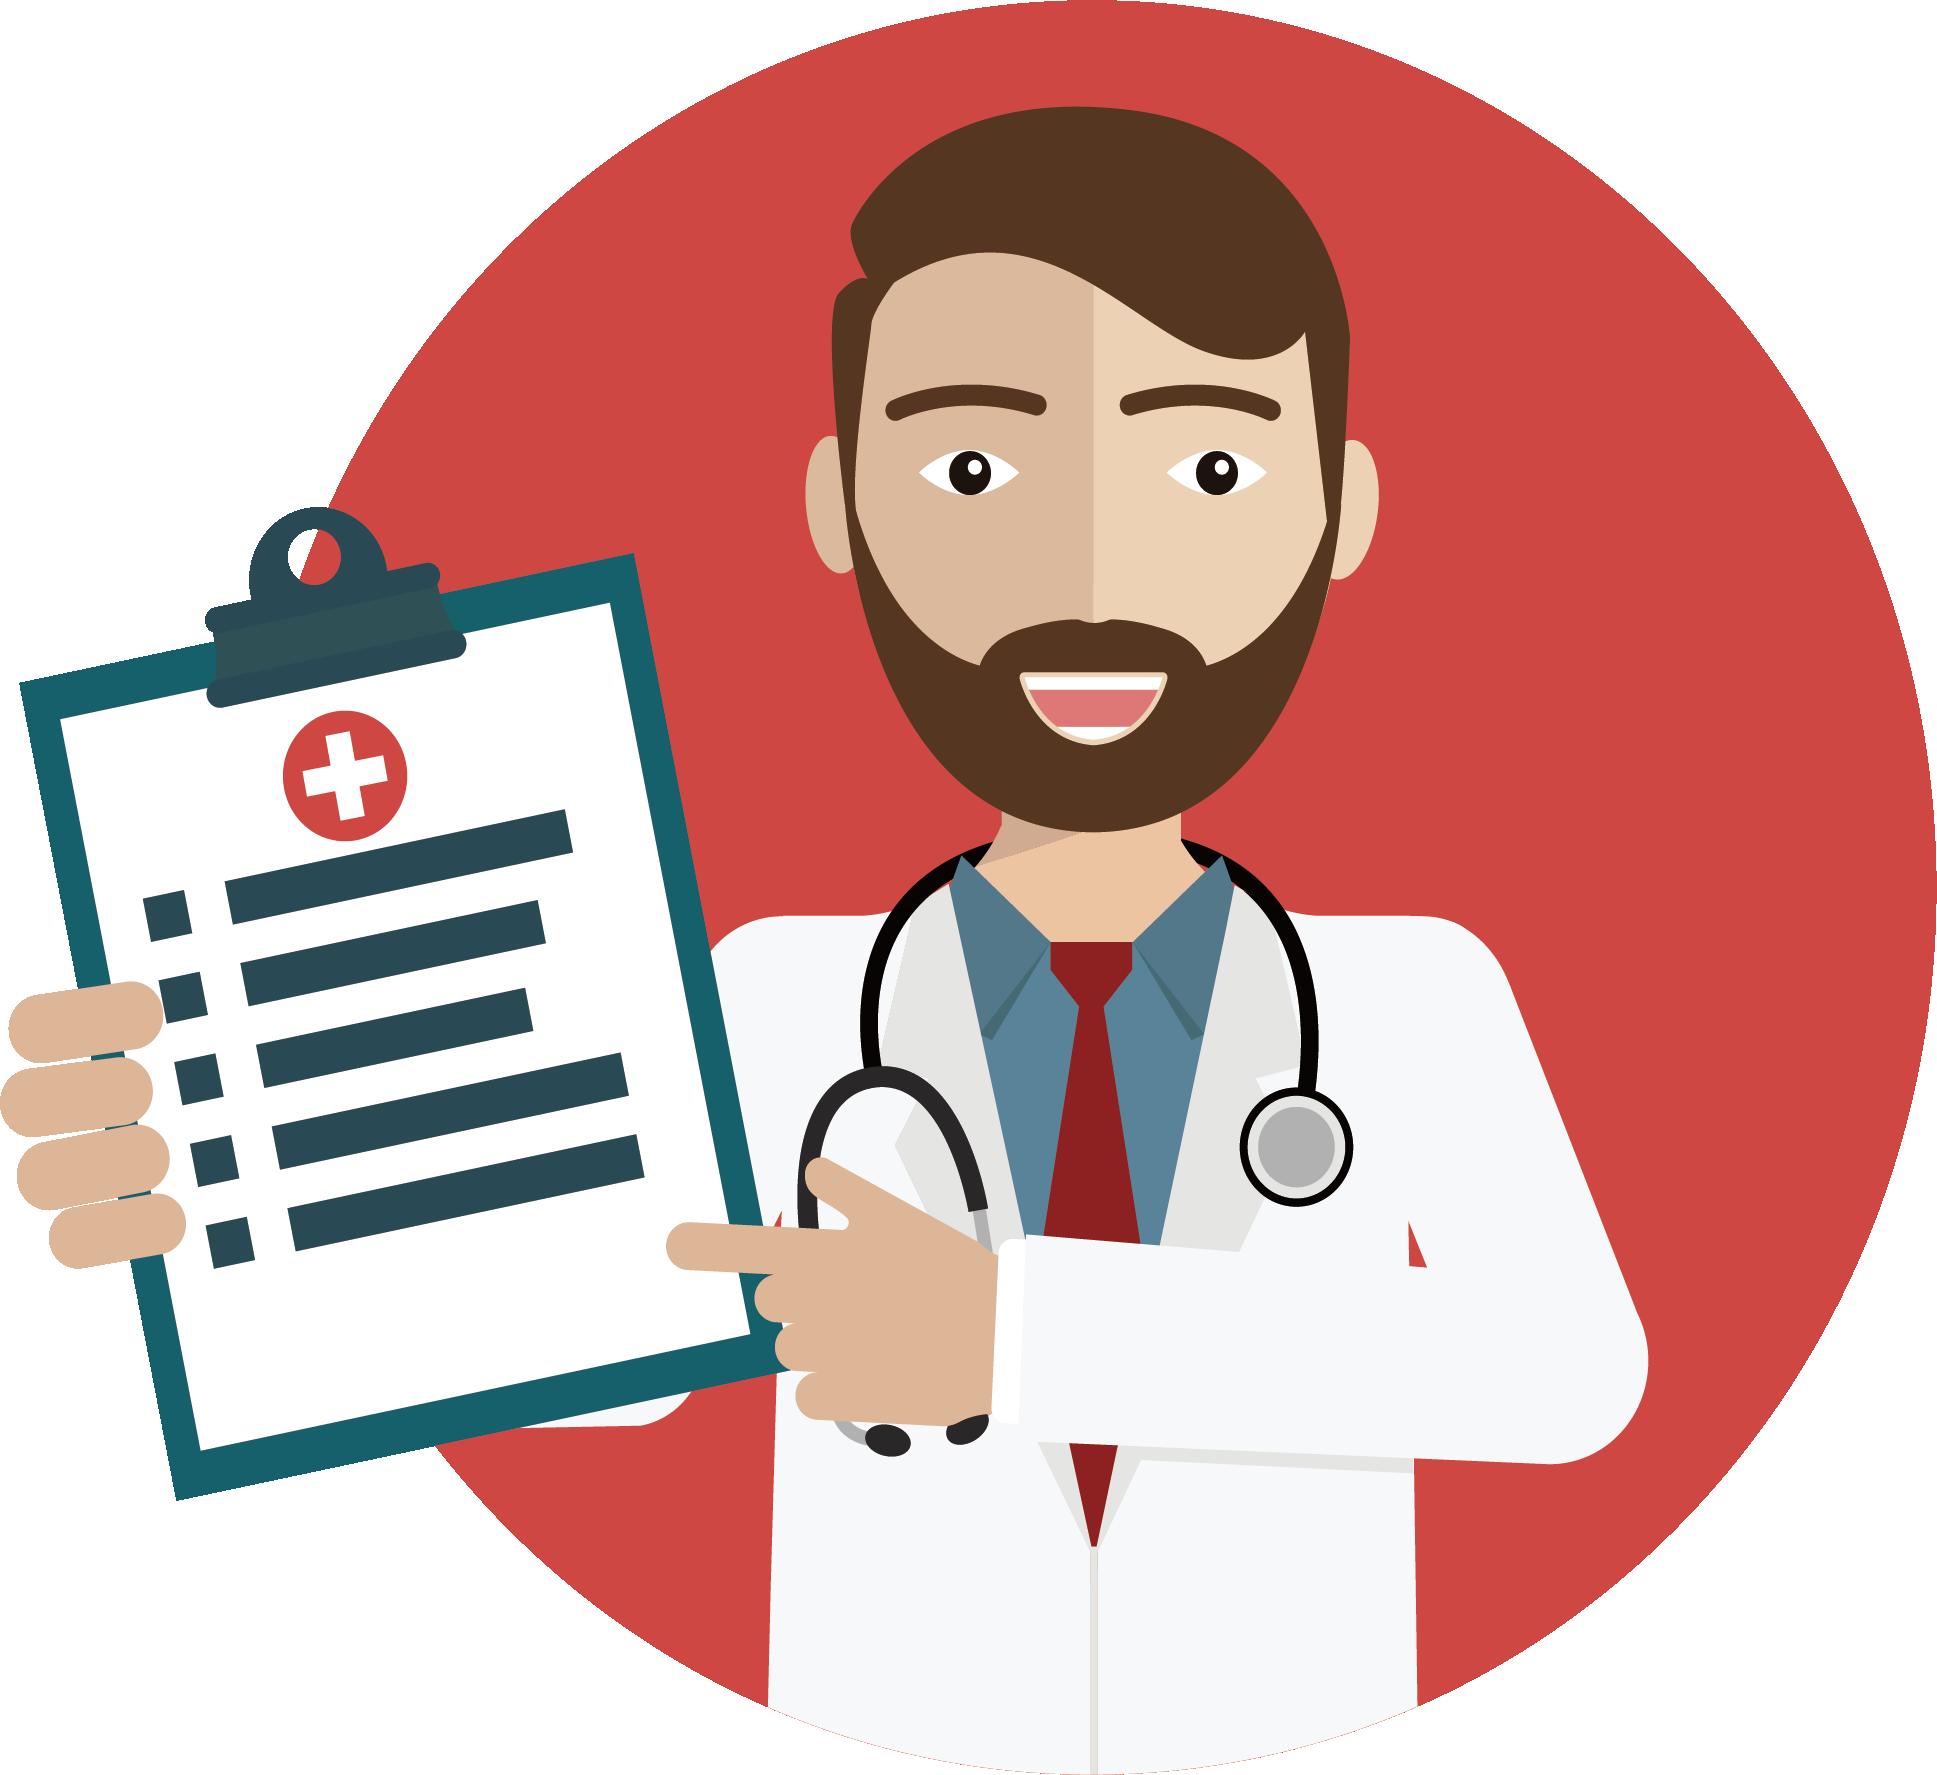 Physician medicine health medical. Healthcare clipart personal care service